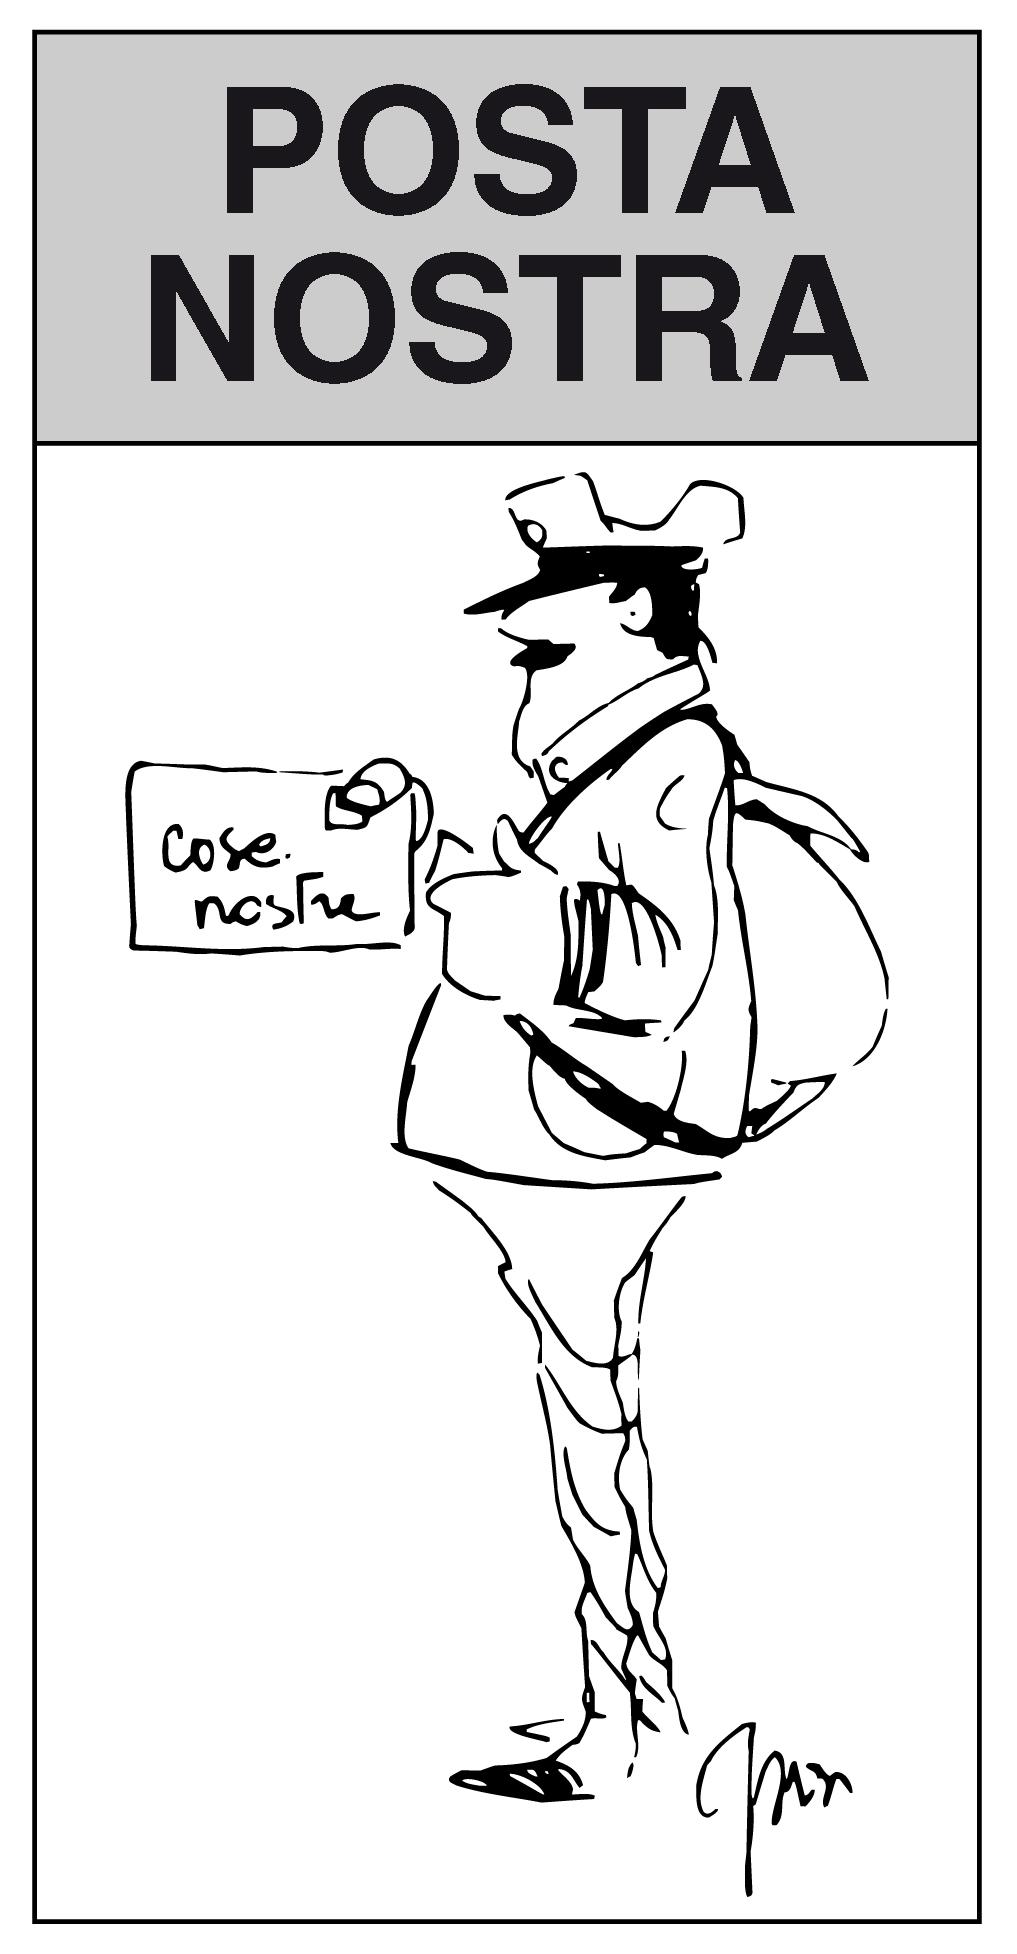 PostaNostra